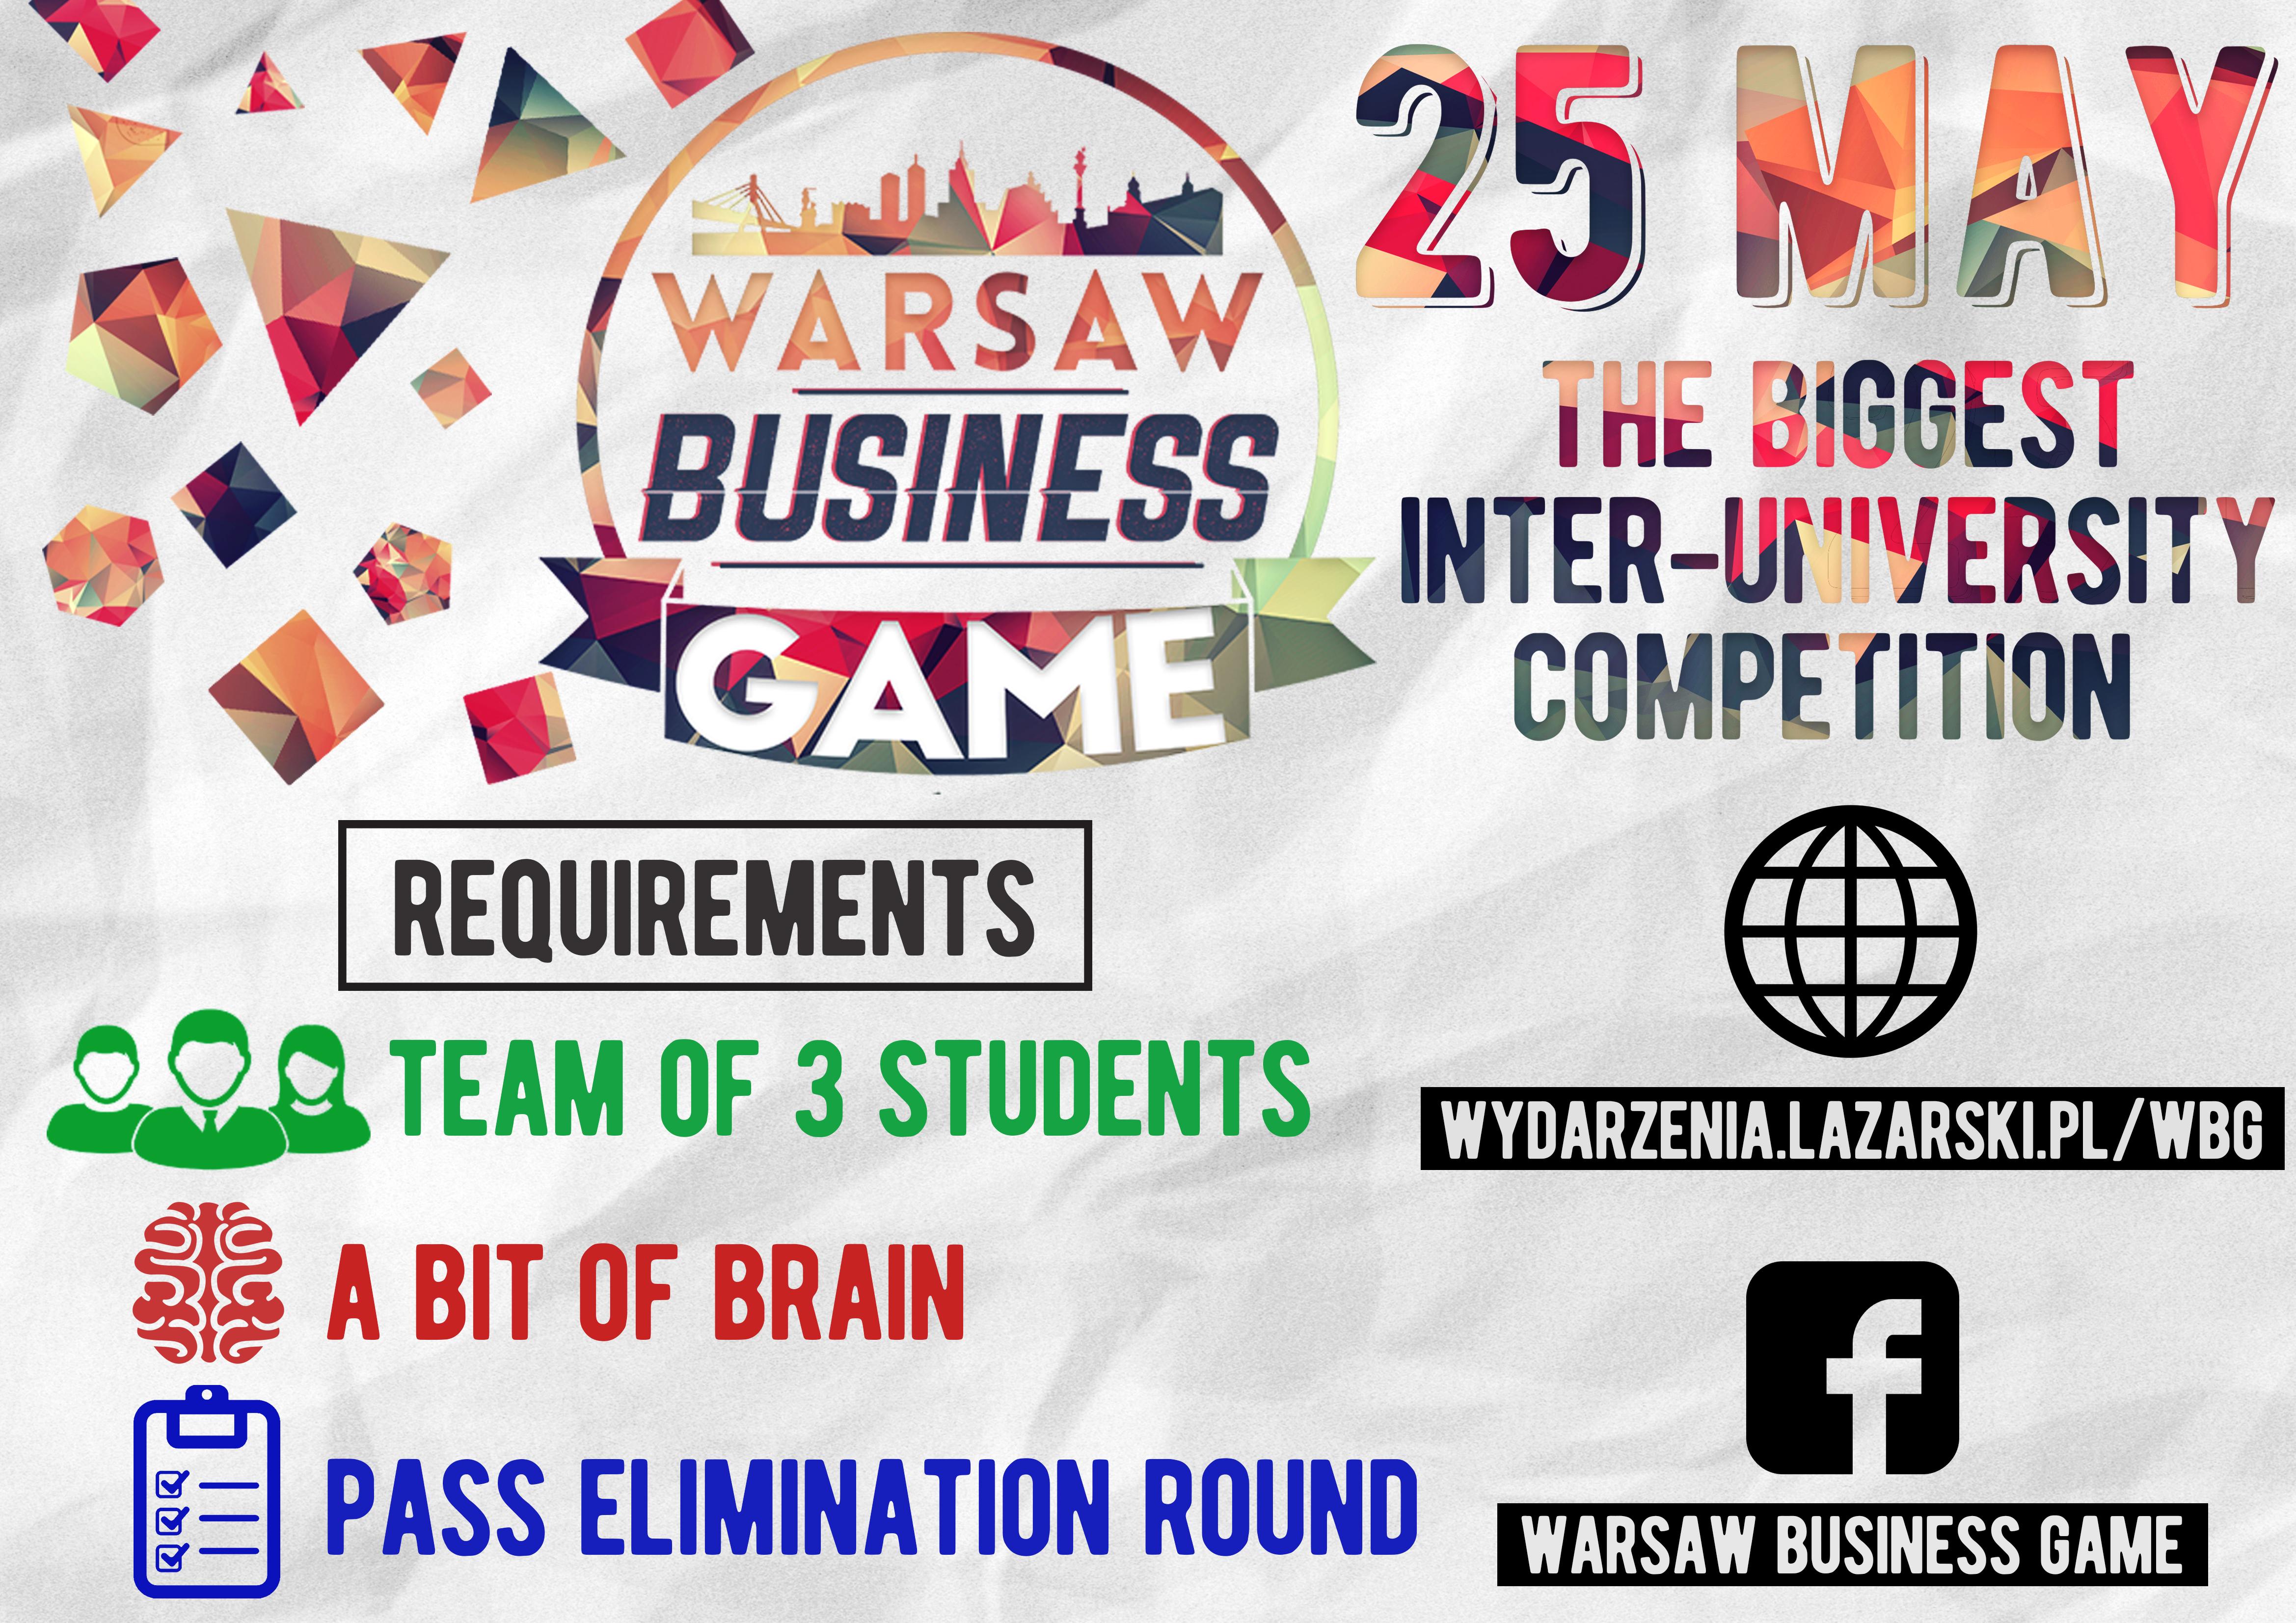 Warsaw Business Game (WBG)